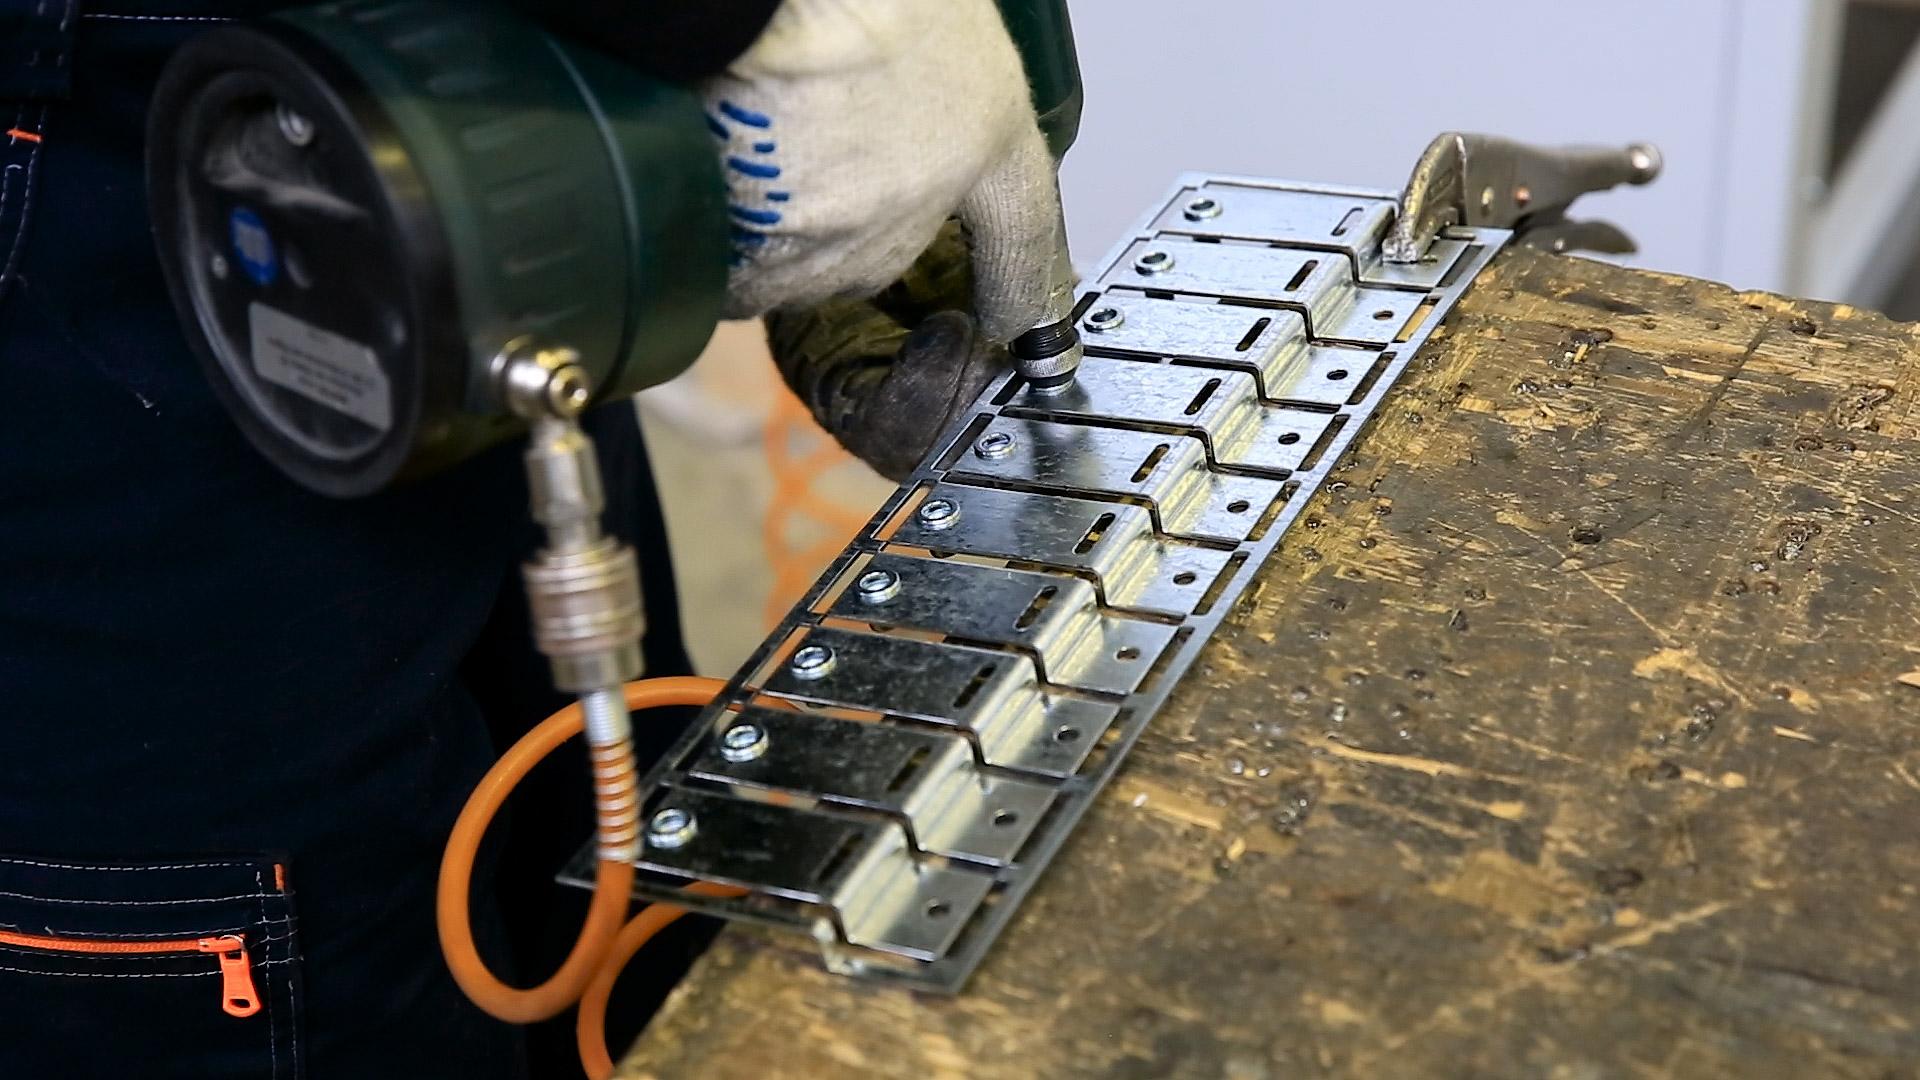 Perfolux metal fabrication, PEM Fastener Insertion Operations